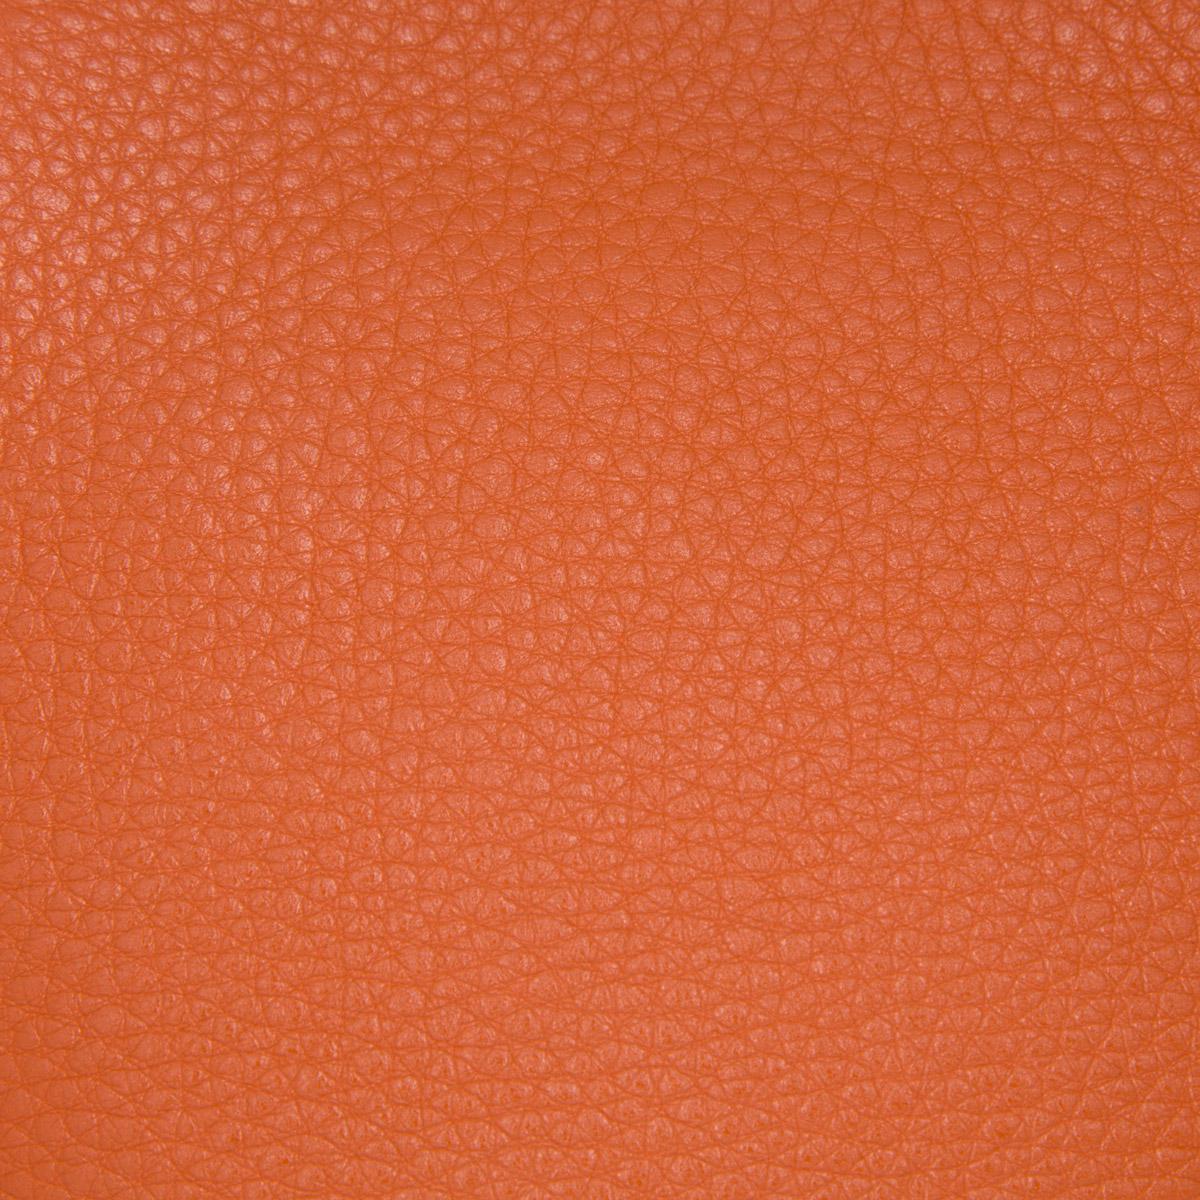 d8cba59c6bb8b6 Michael Kors Hadley Md Messenger Leather Orange in Orange - Lyst